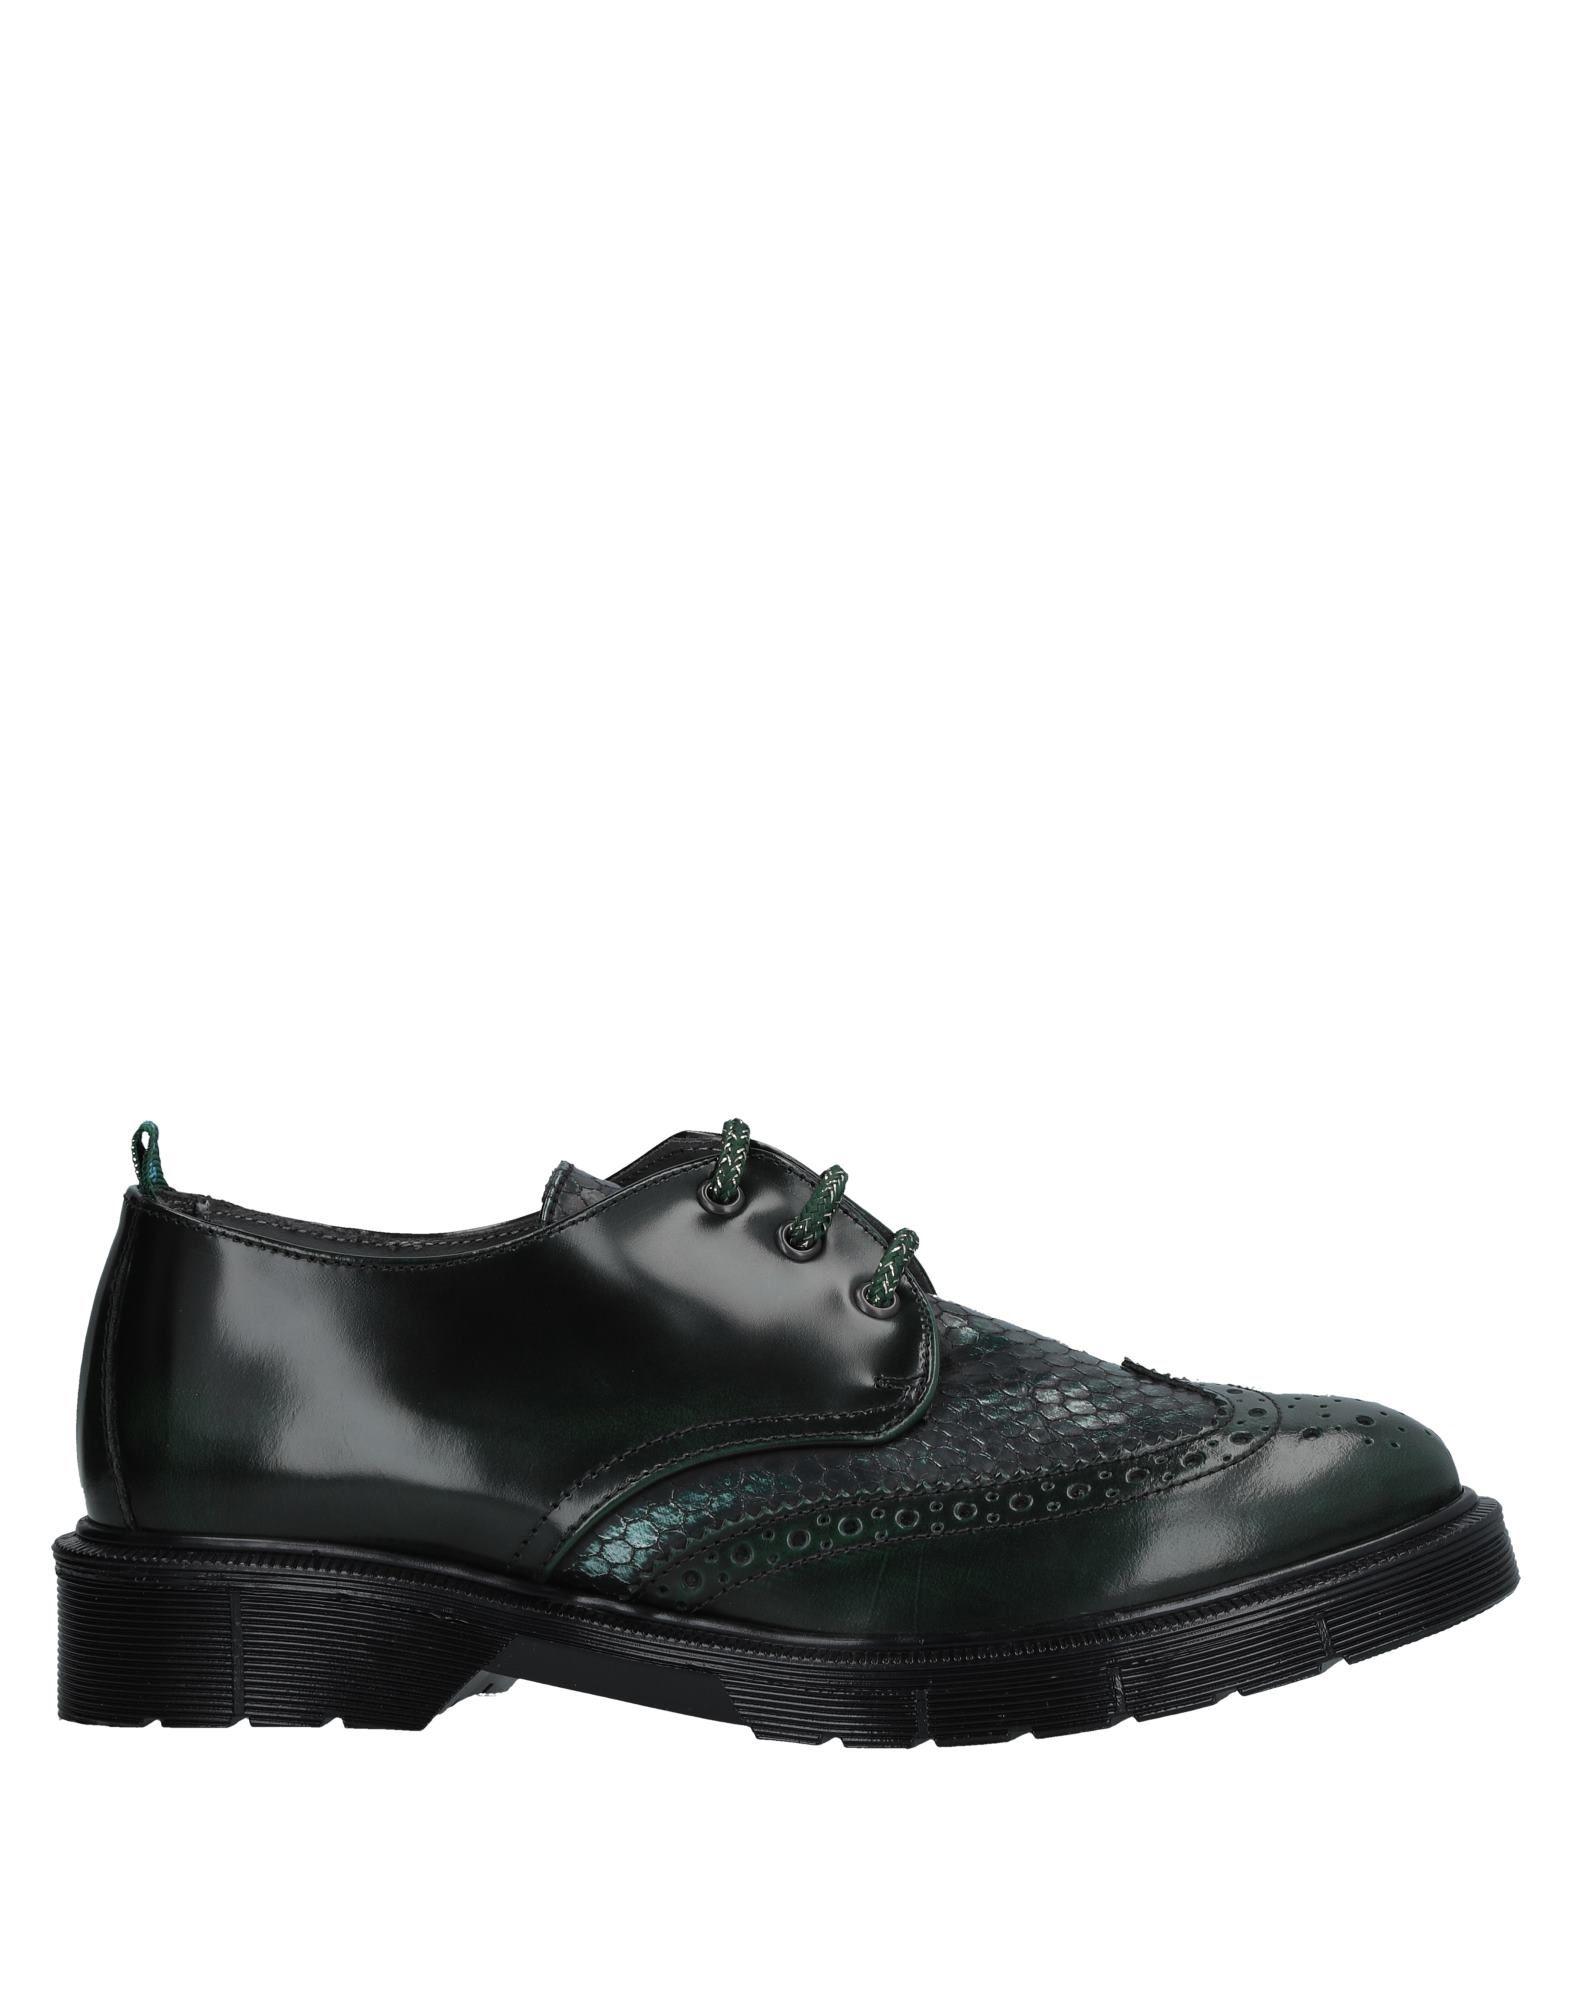 SNOBS® Обувь на шнурках первый внутри обувь обувь обувь обувь обувь обувь обувь обувь обувь 8a2549 мужская армия green 40 метров